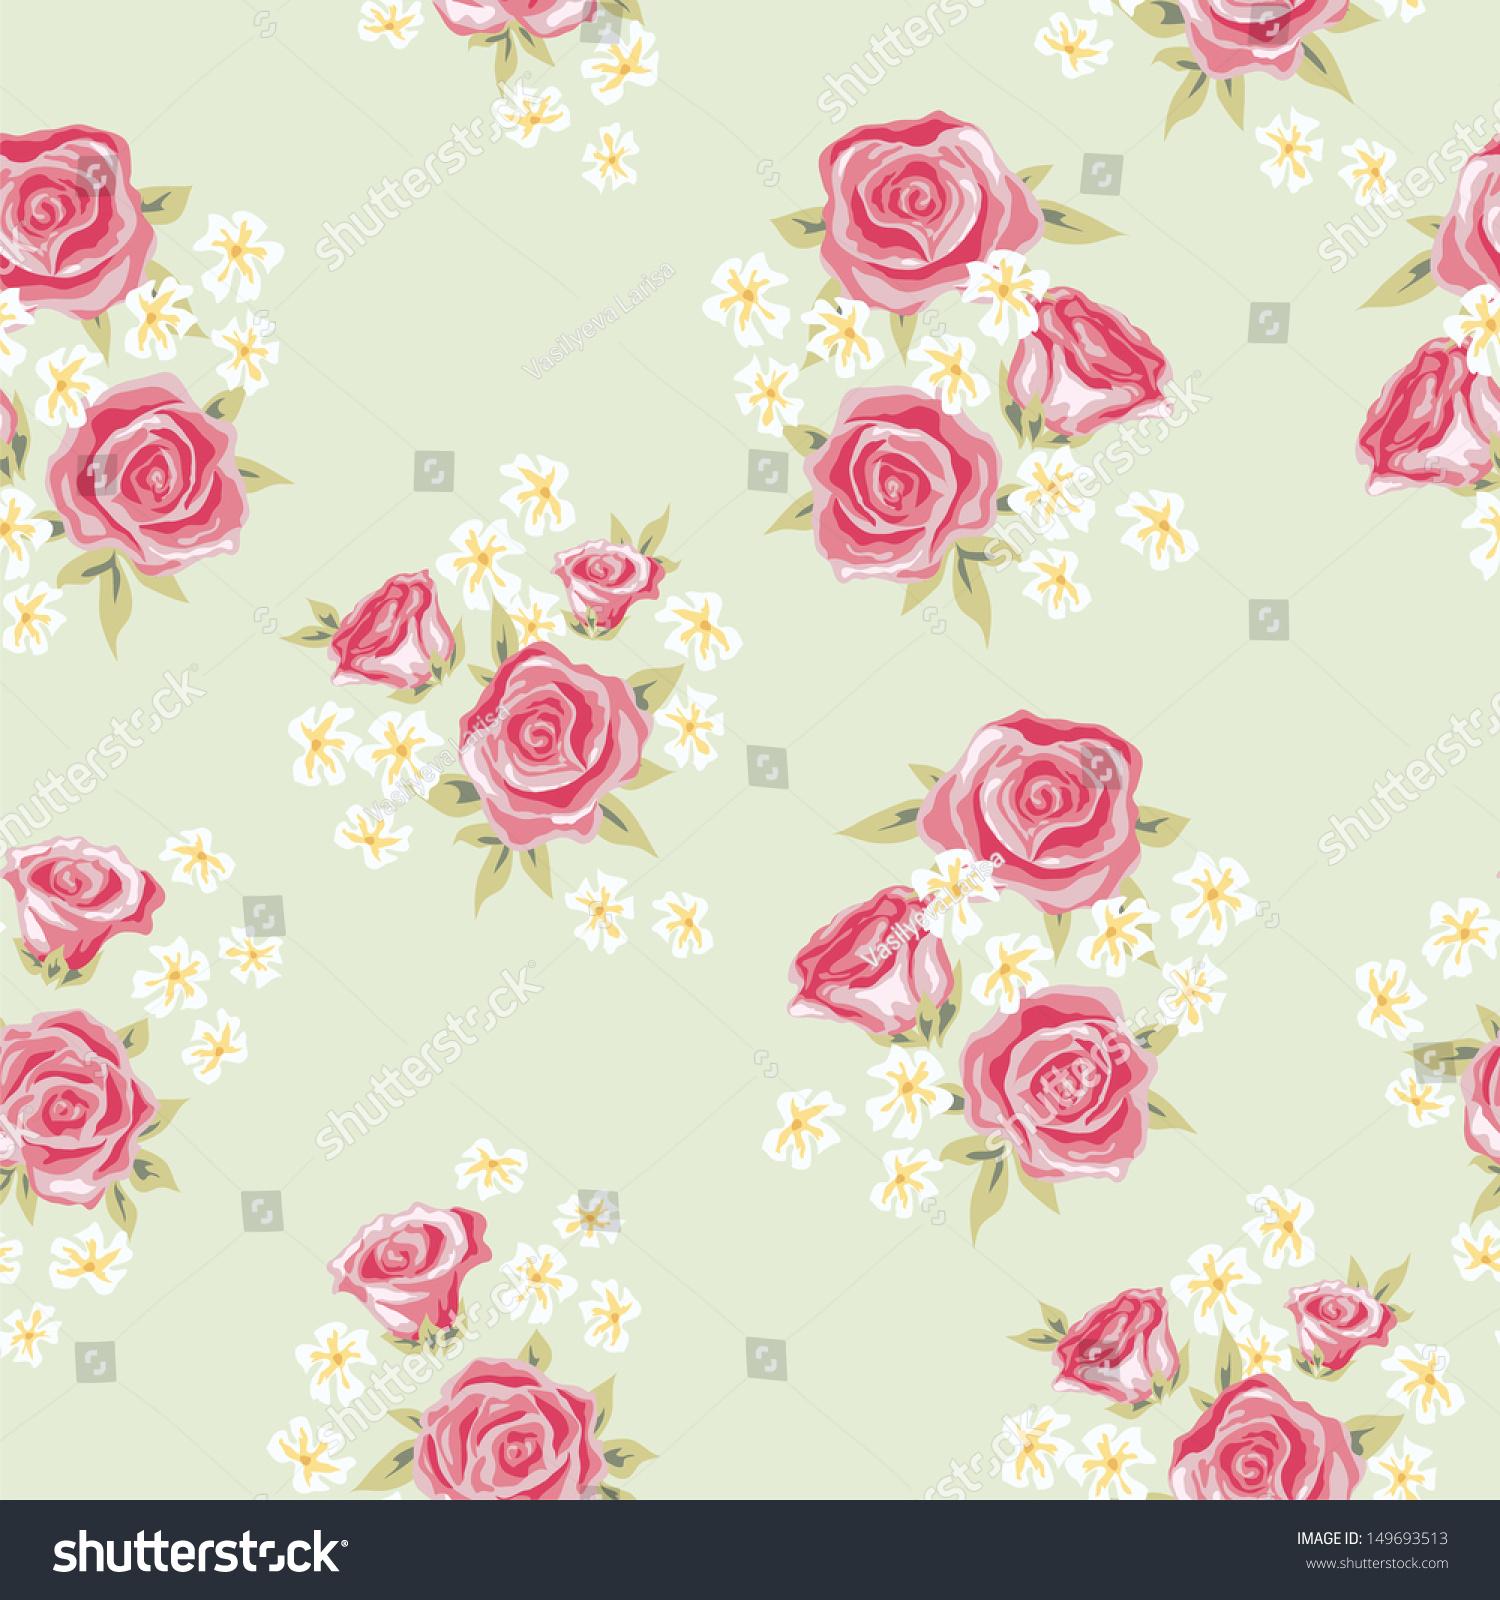 floral seamless vintage pattern shabby chic image vectorielle de